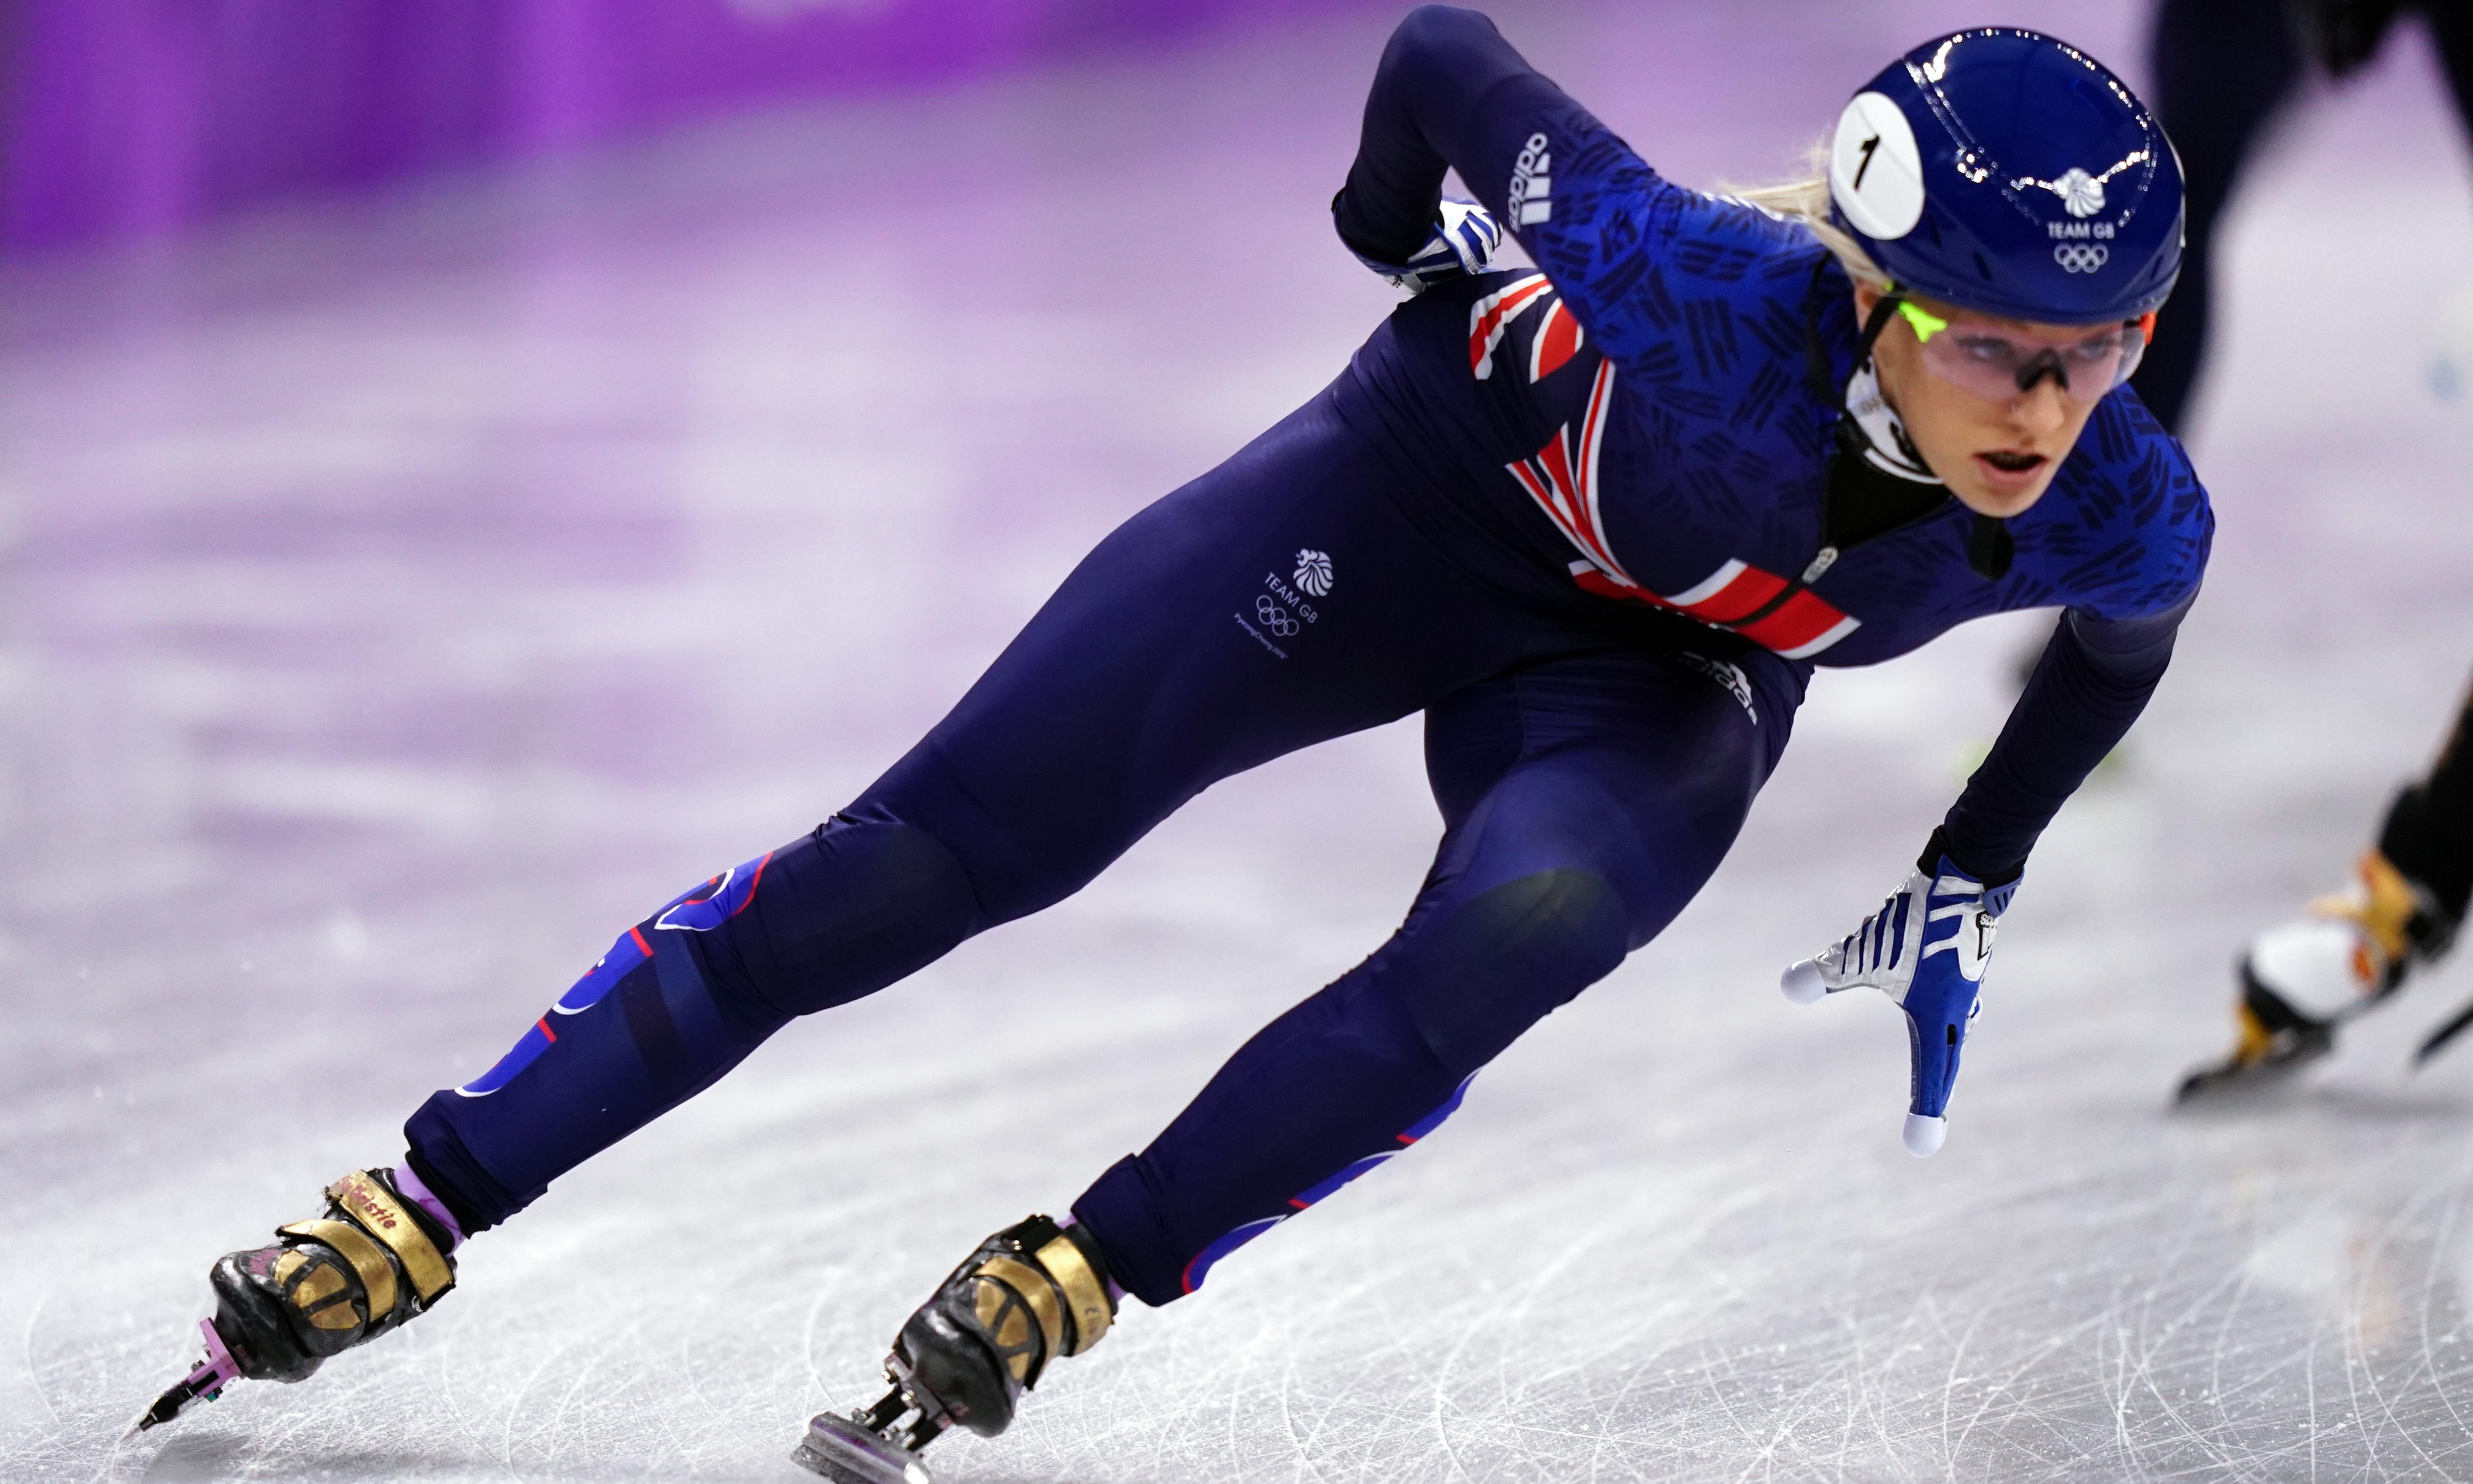 World champion speed skater Elise Christie reveals fight against depression